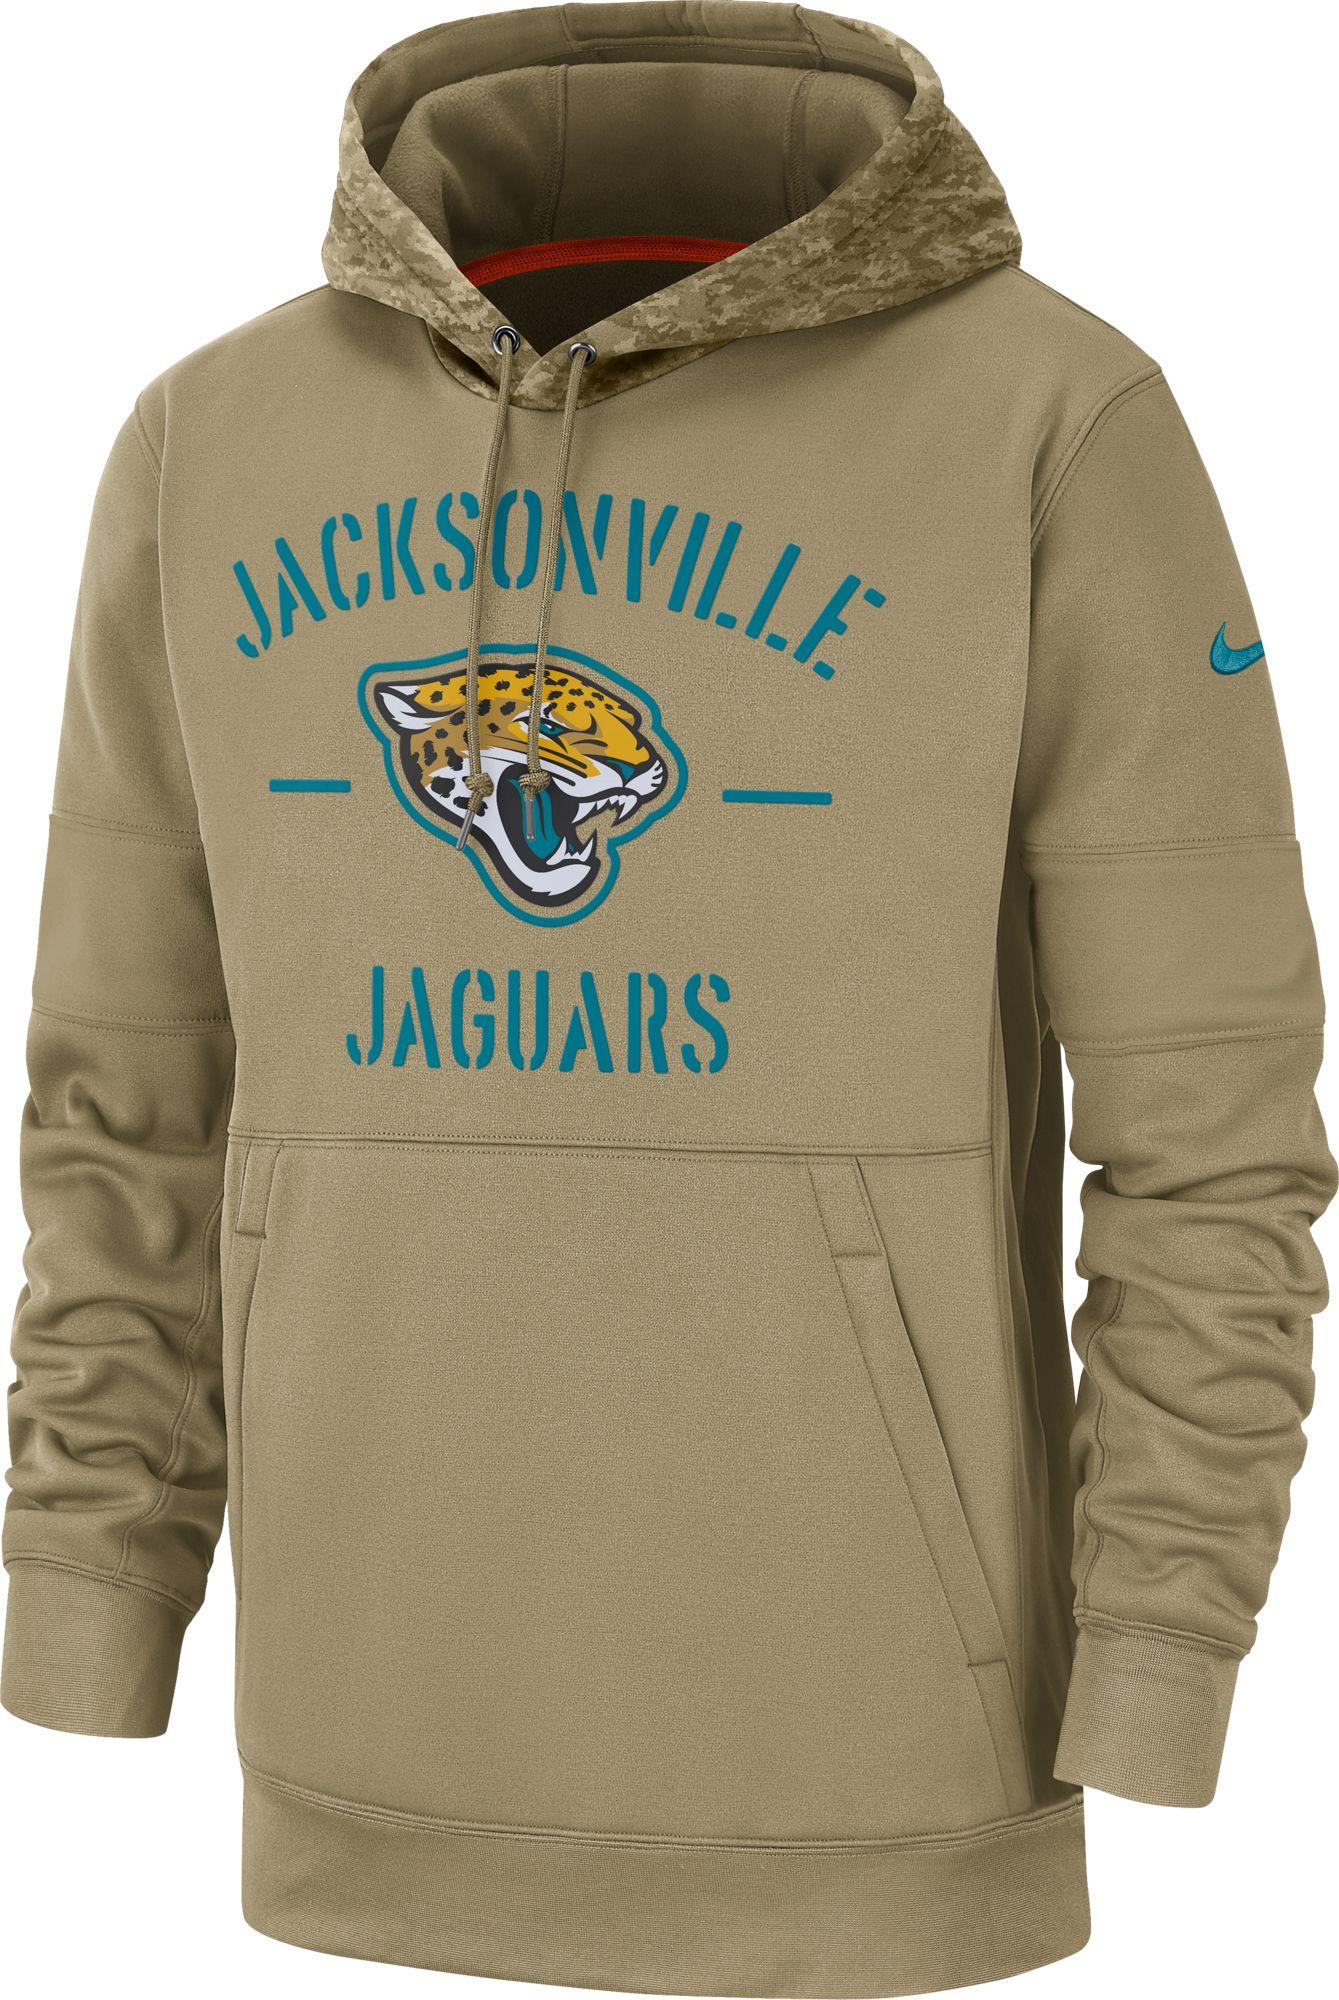 jaguars sweatshirt